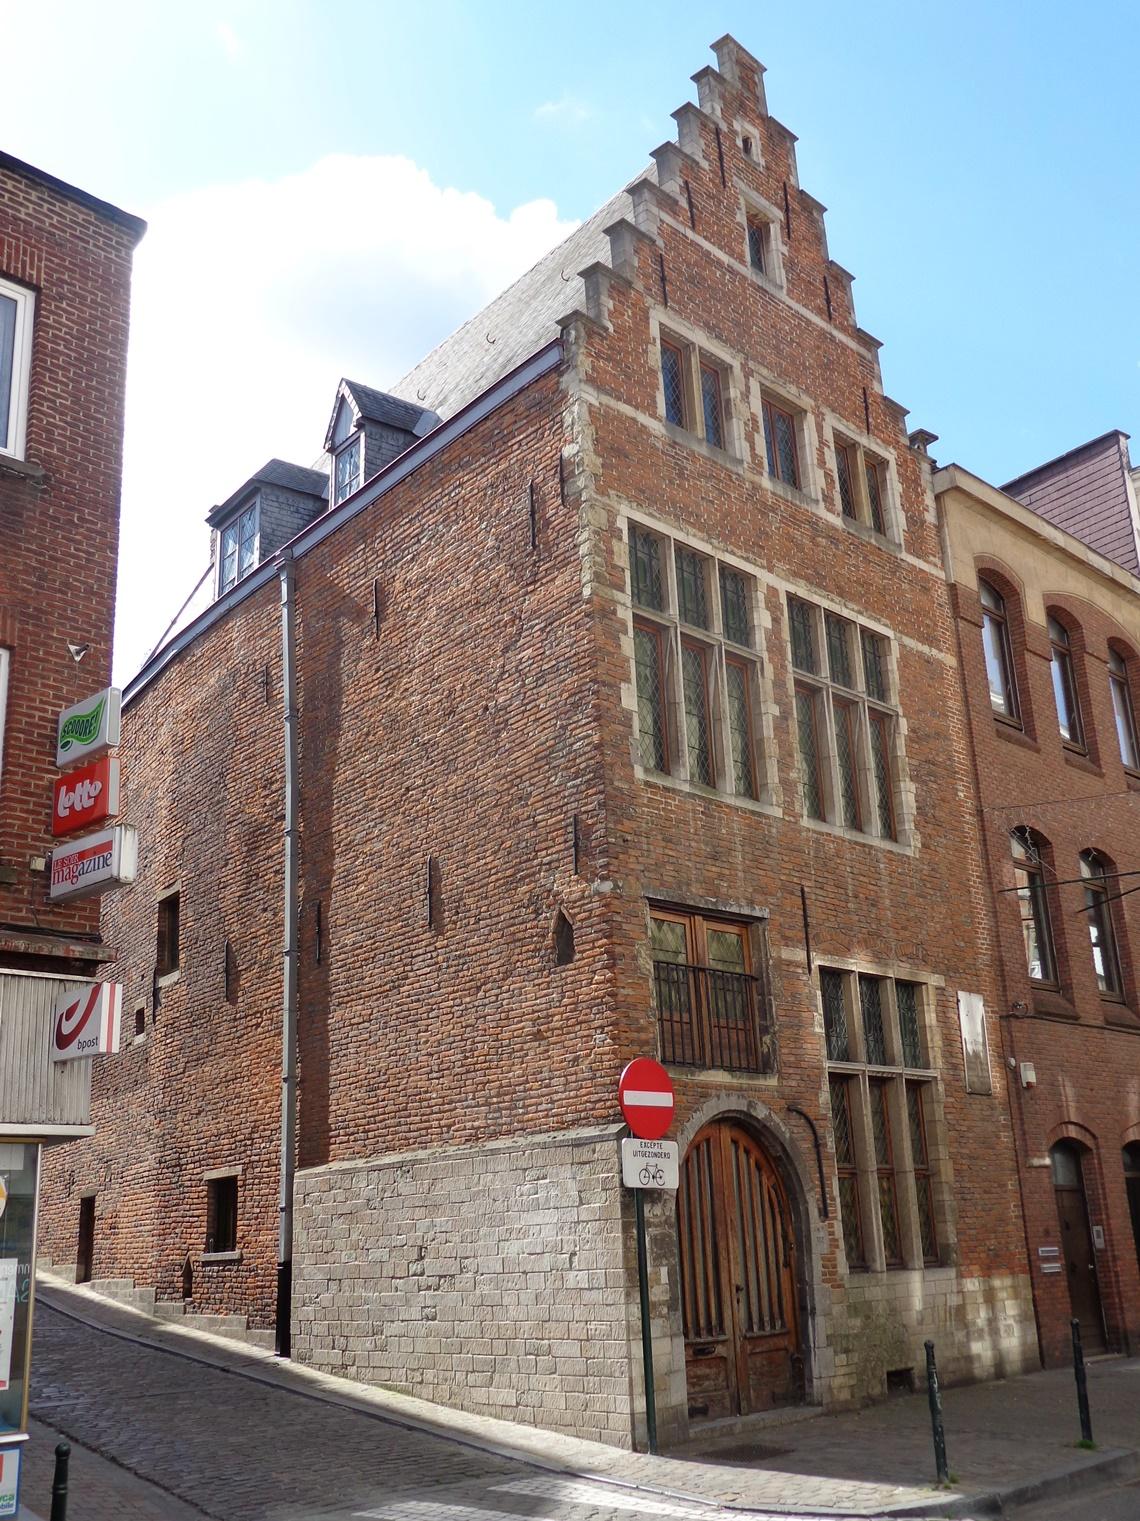 Hoogstraat 132, Breugelhuis, 2015